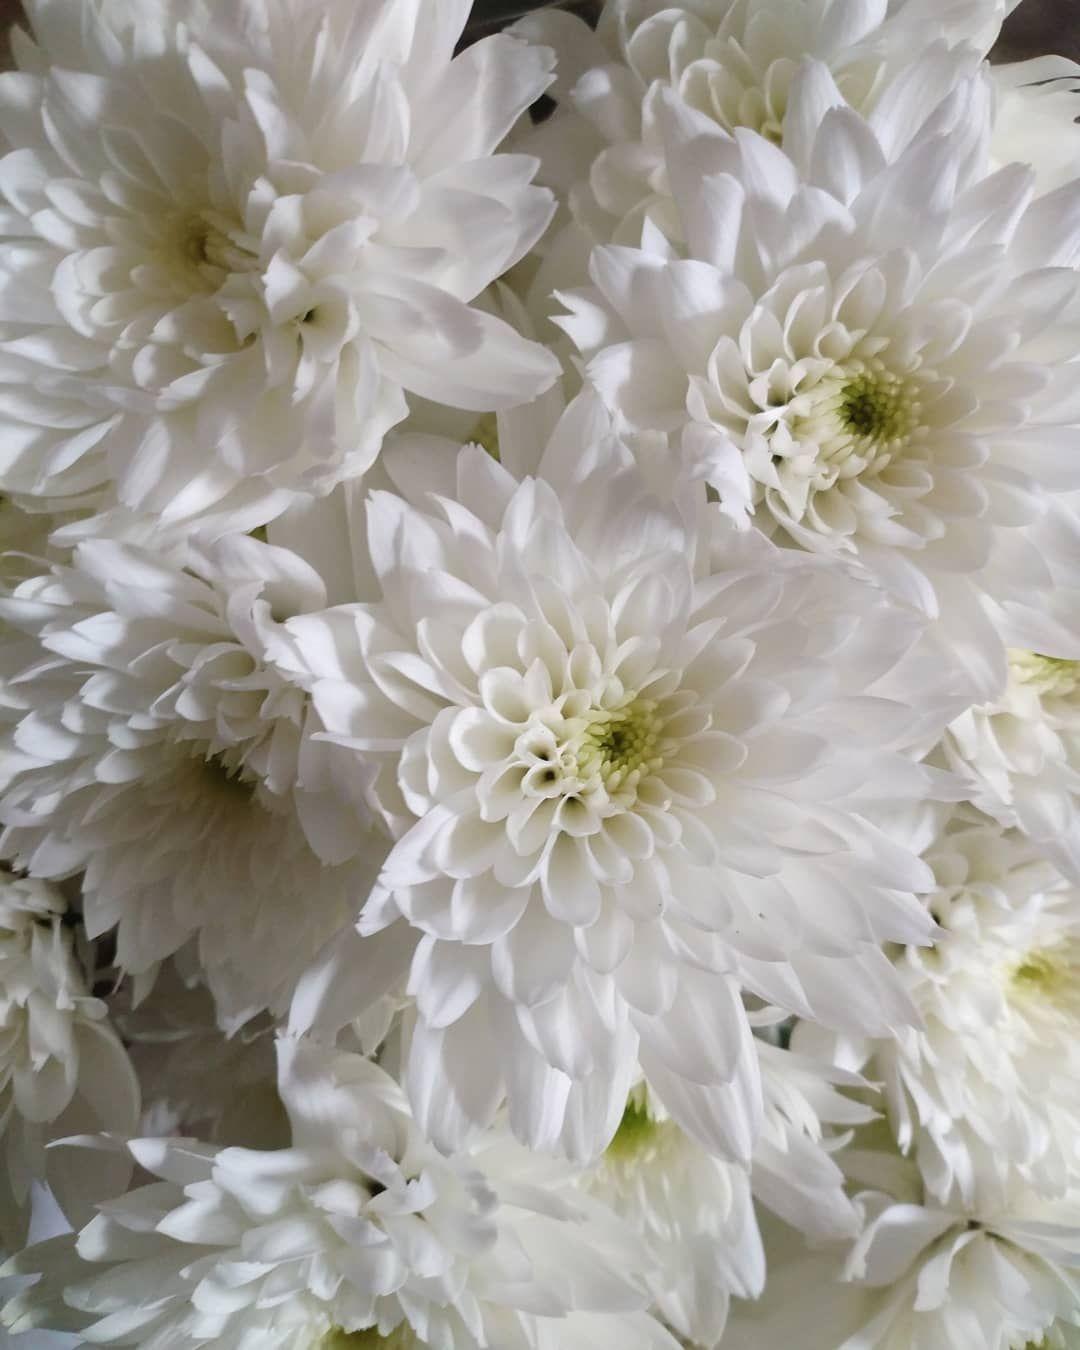 Oh my Grandma #flower #flowers #gift #presents #present #birthday #birthdayweekend #birthdayweek #birthdayfun #birthdaylove ##birthdaygirl #like #followme #sancarlino #whiteflowers #whiteflower #picofpic #picofday #photography #photooftheday #potd #instalike #instamoment #instagram #igers